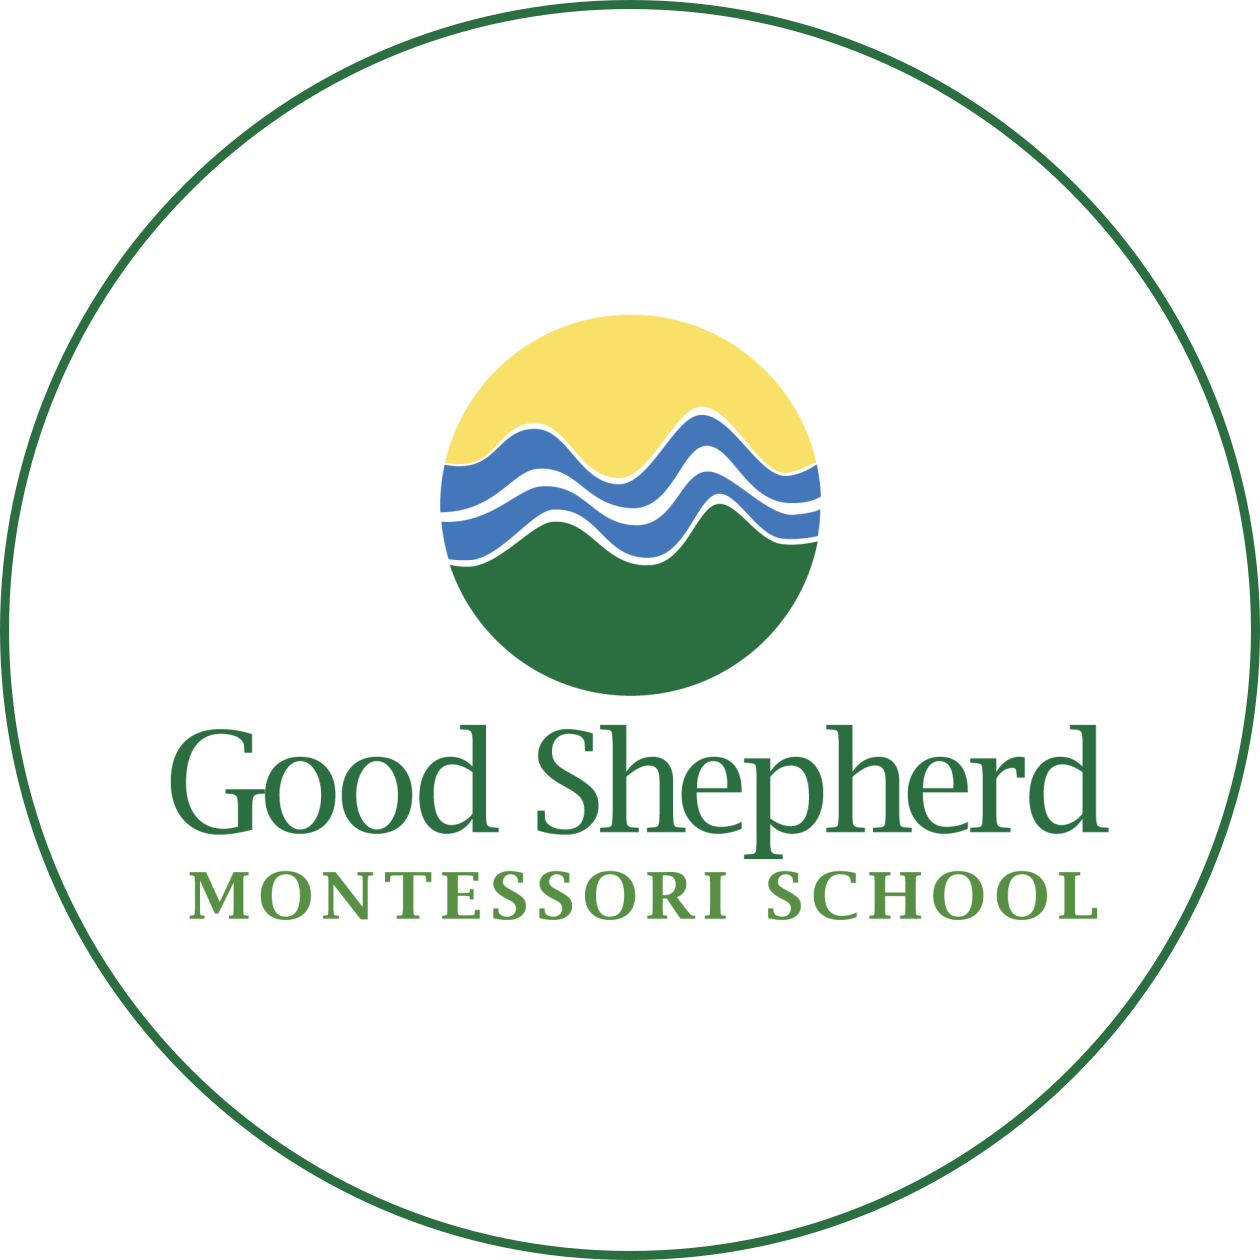 Good Shepherd Montessori School - South Bend, IndianaFull Member